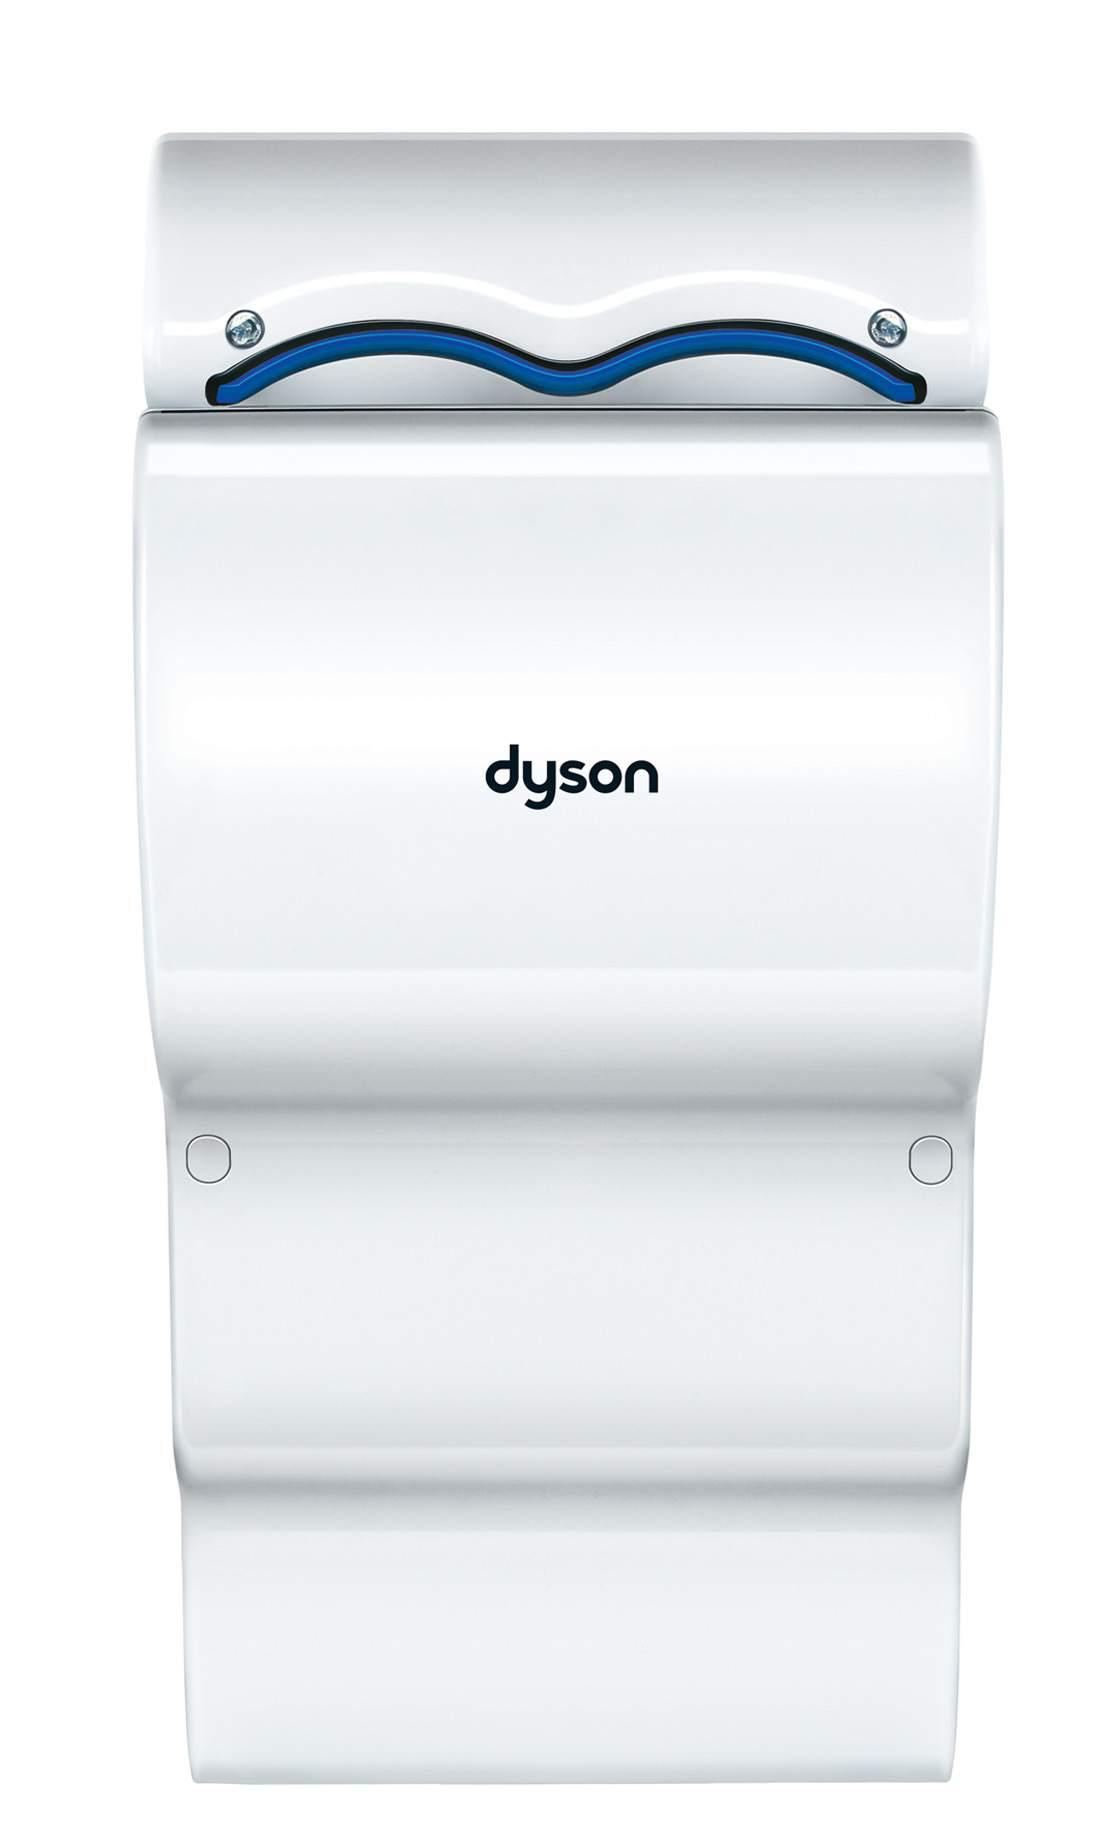 Dyson sušič rúk Dyson AIRBLADE dB AB14 biely